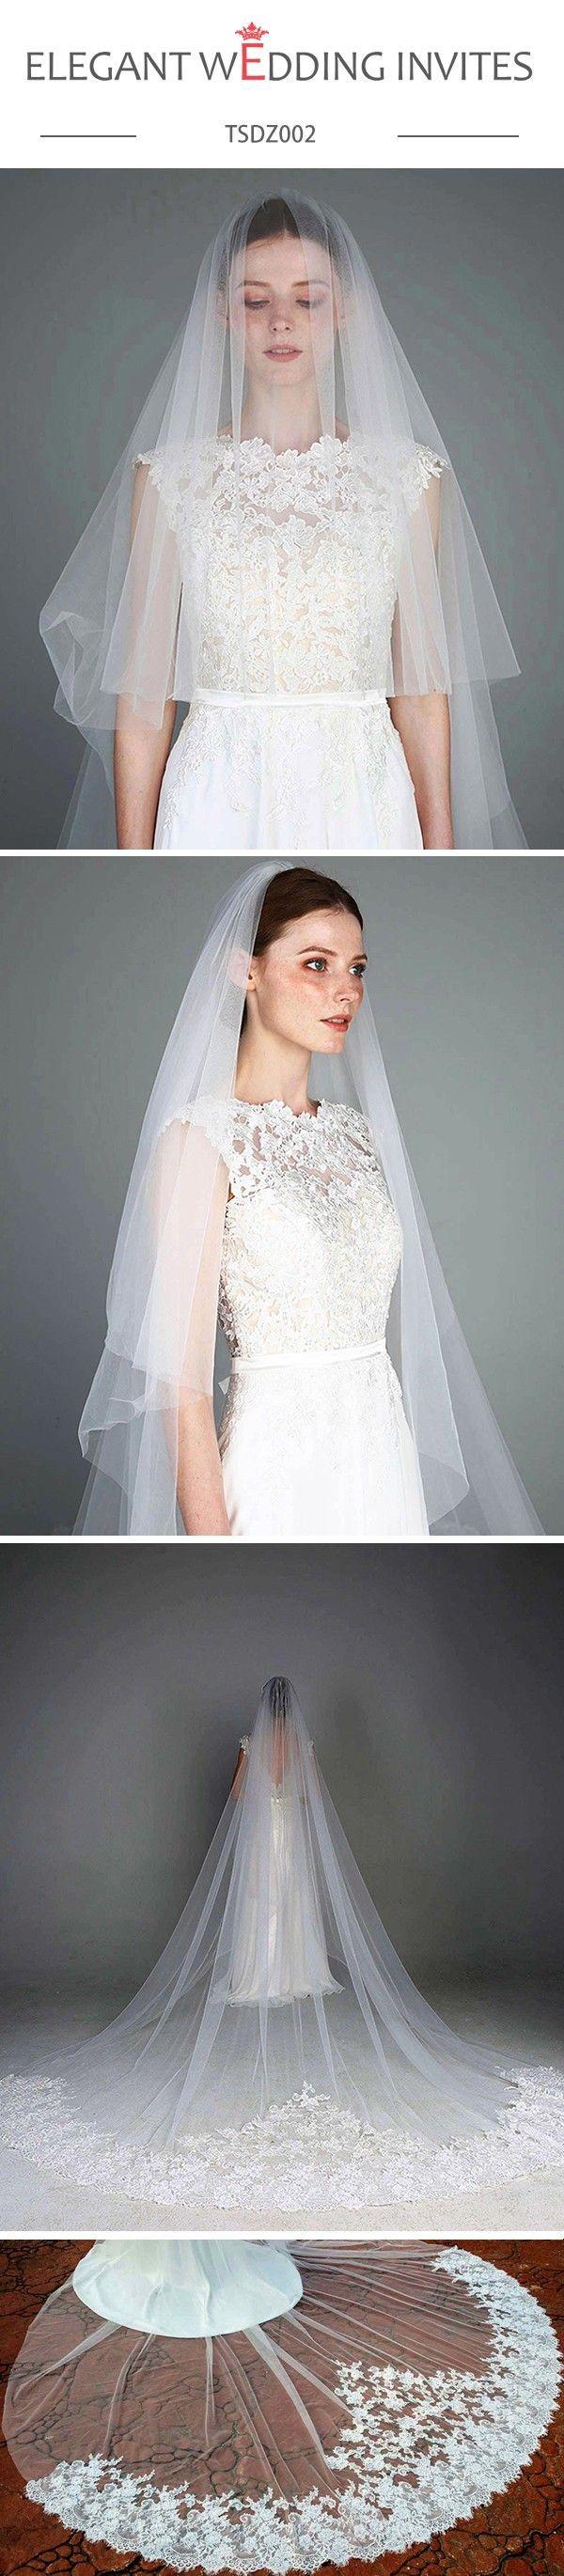 Cathedral veil romantic tiers lace wedding bridal veil boho